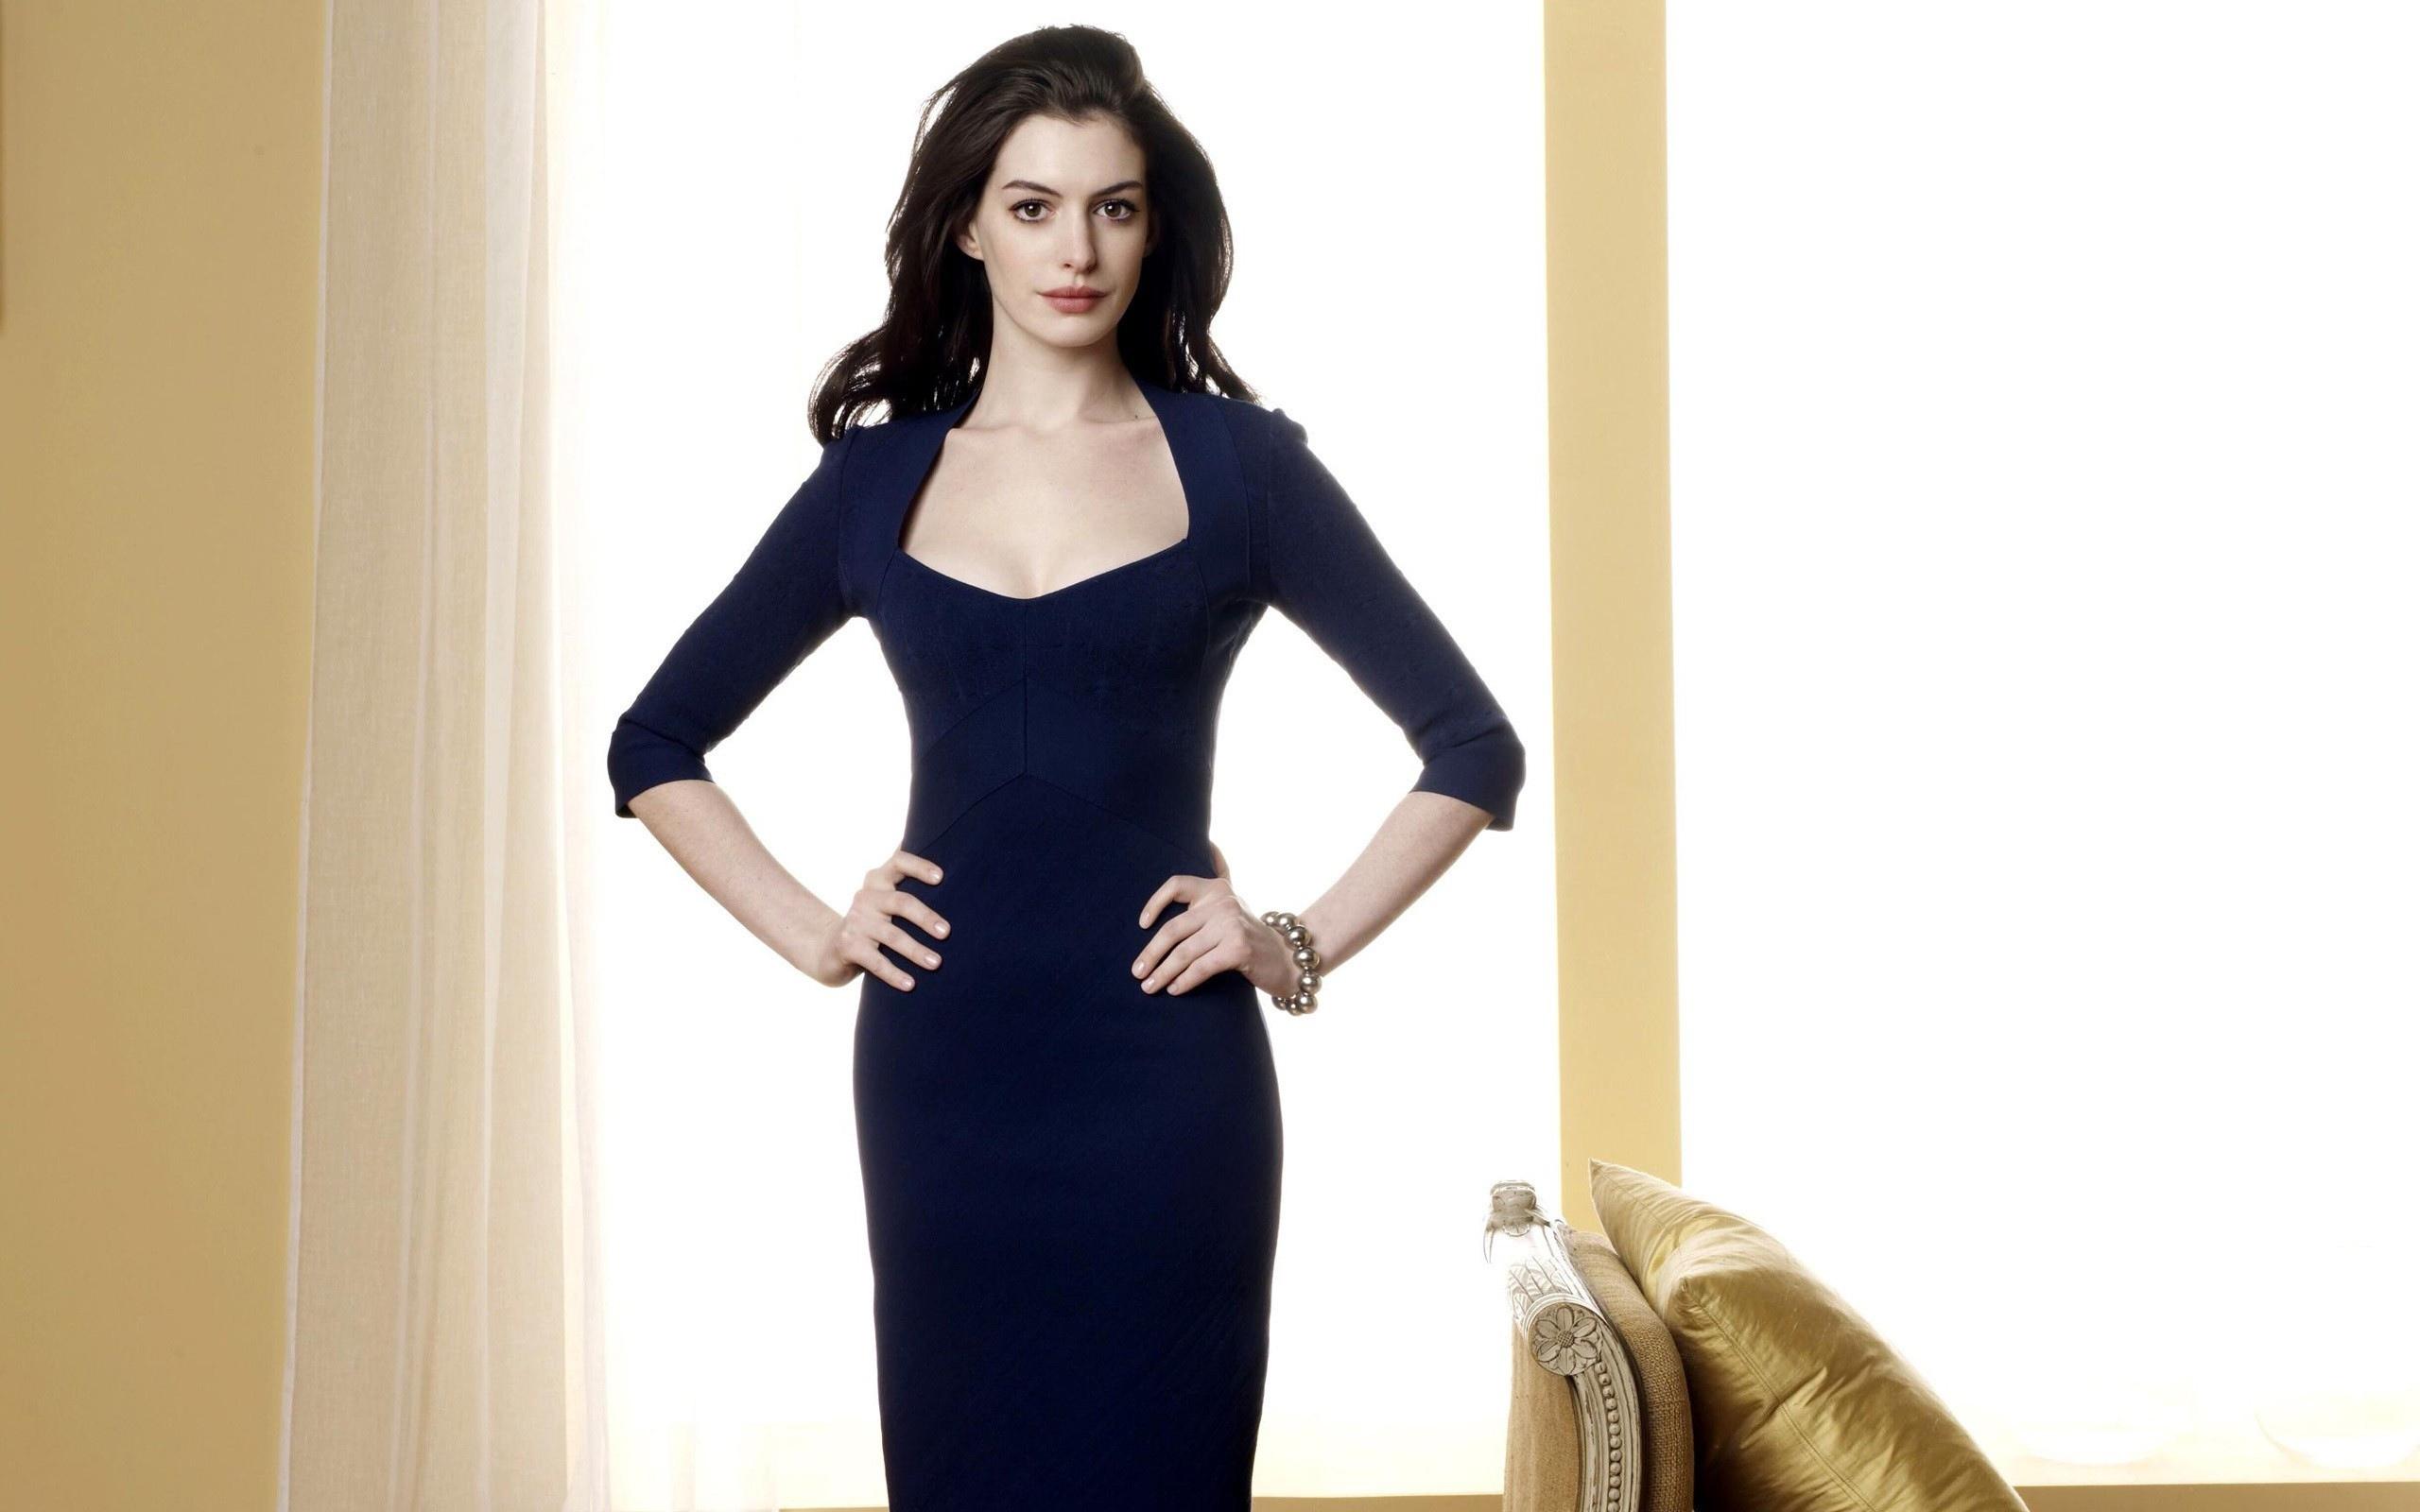 Anne Hathaway Stunning Hd Wallpapers Wallpaper Hd